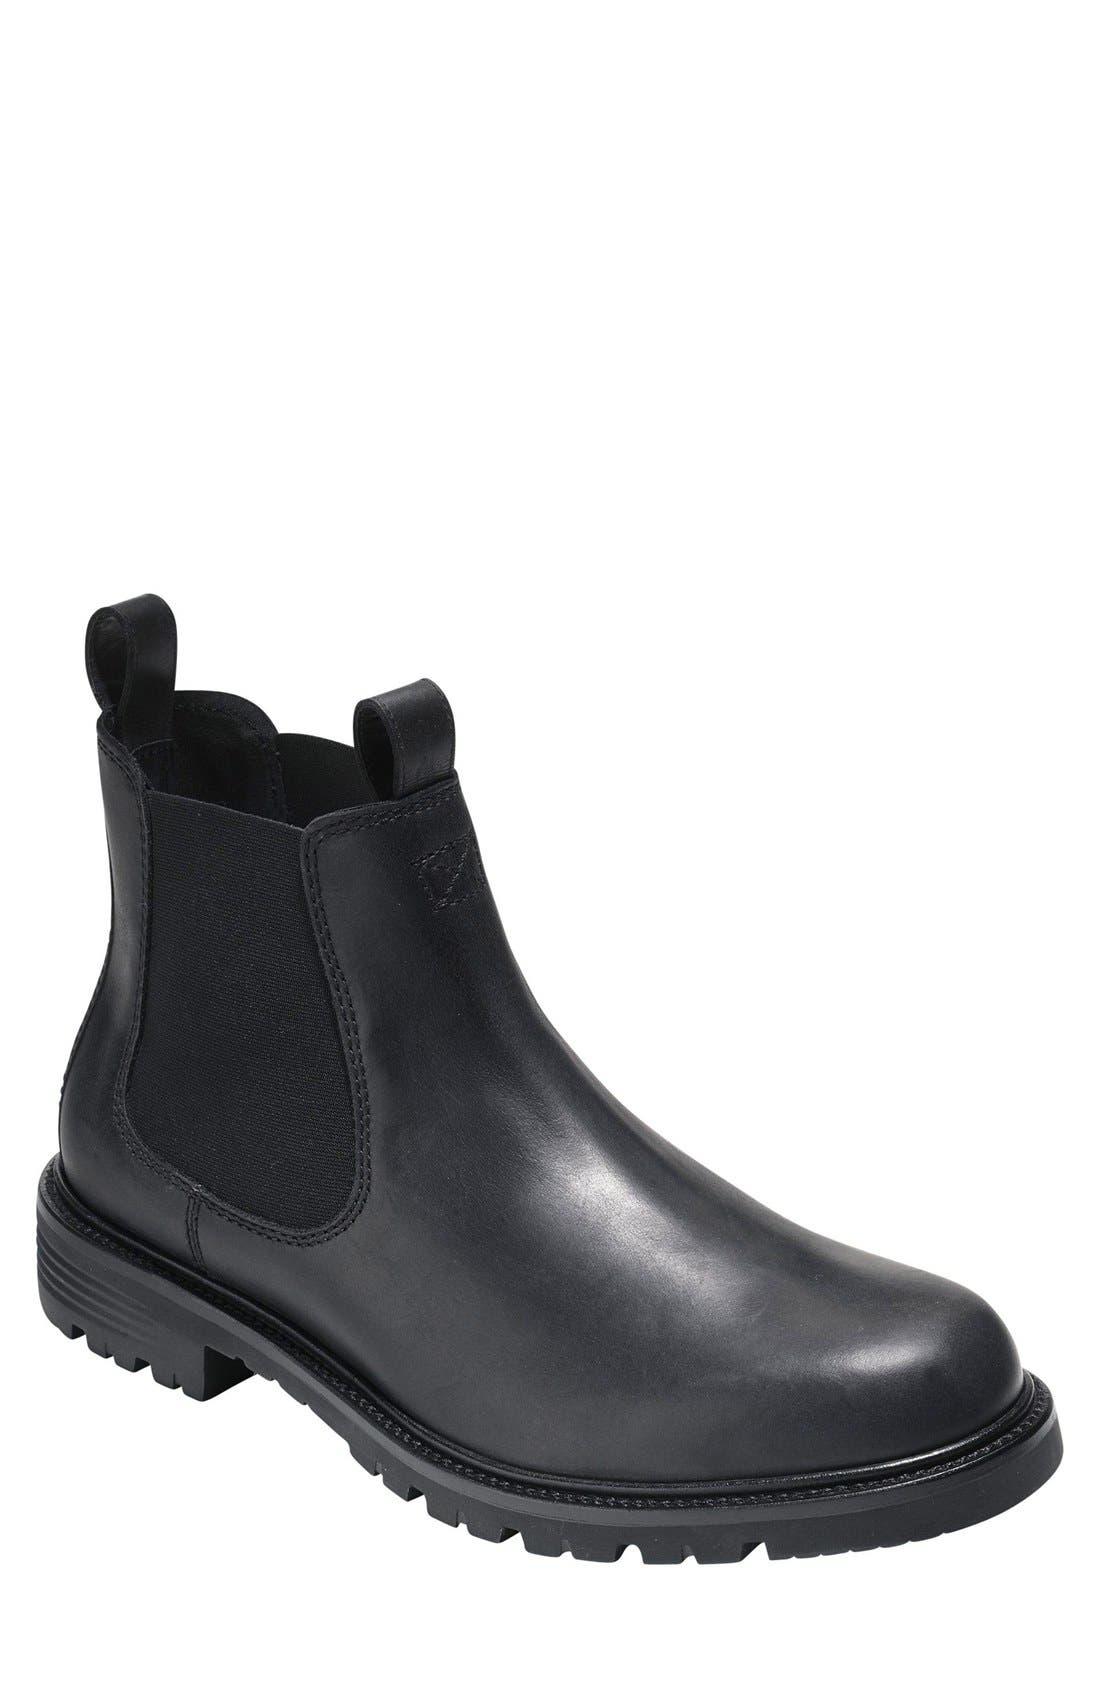 COLE HAAN 'Grantland' Chelsea Boot, Main, color, 001